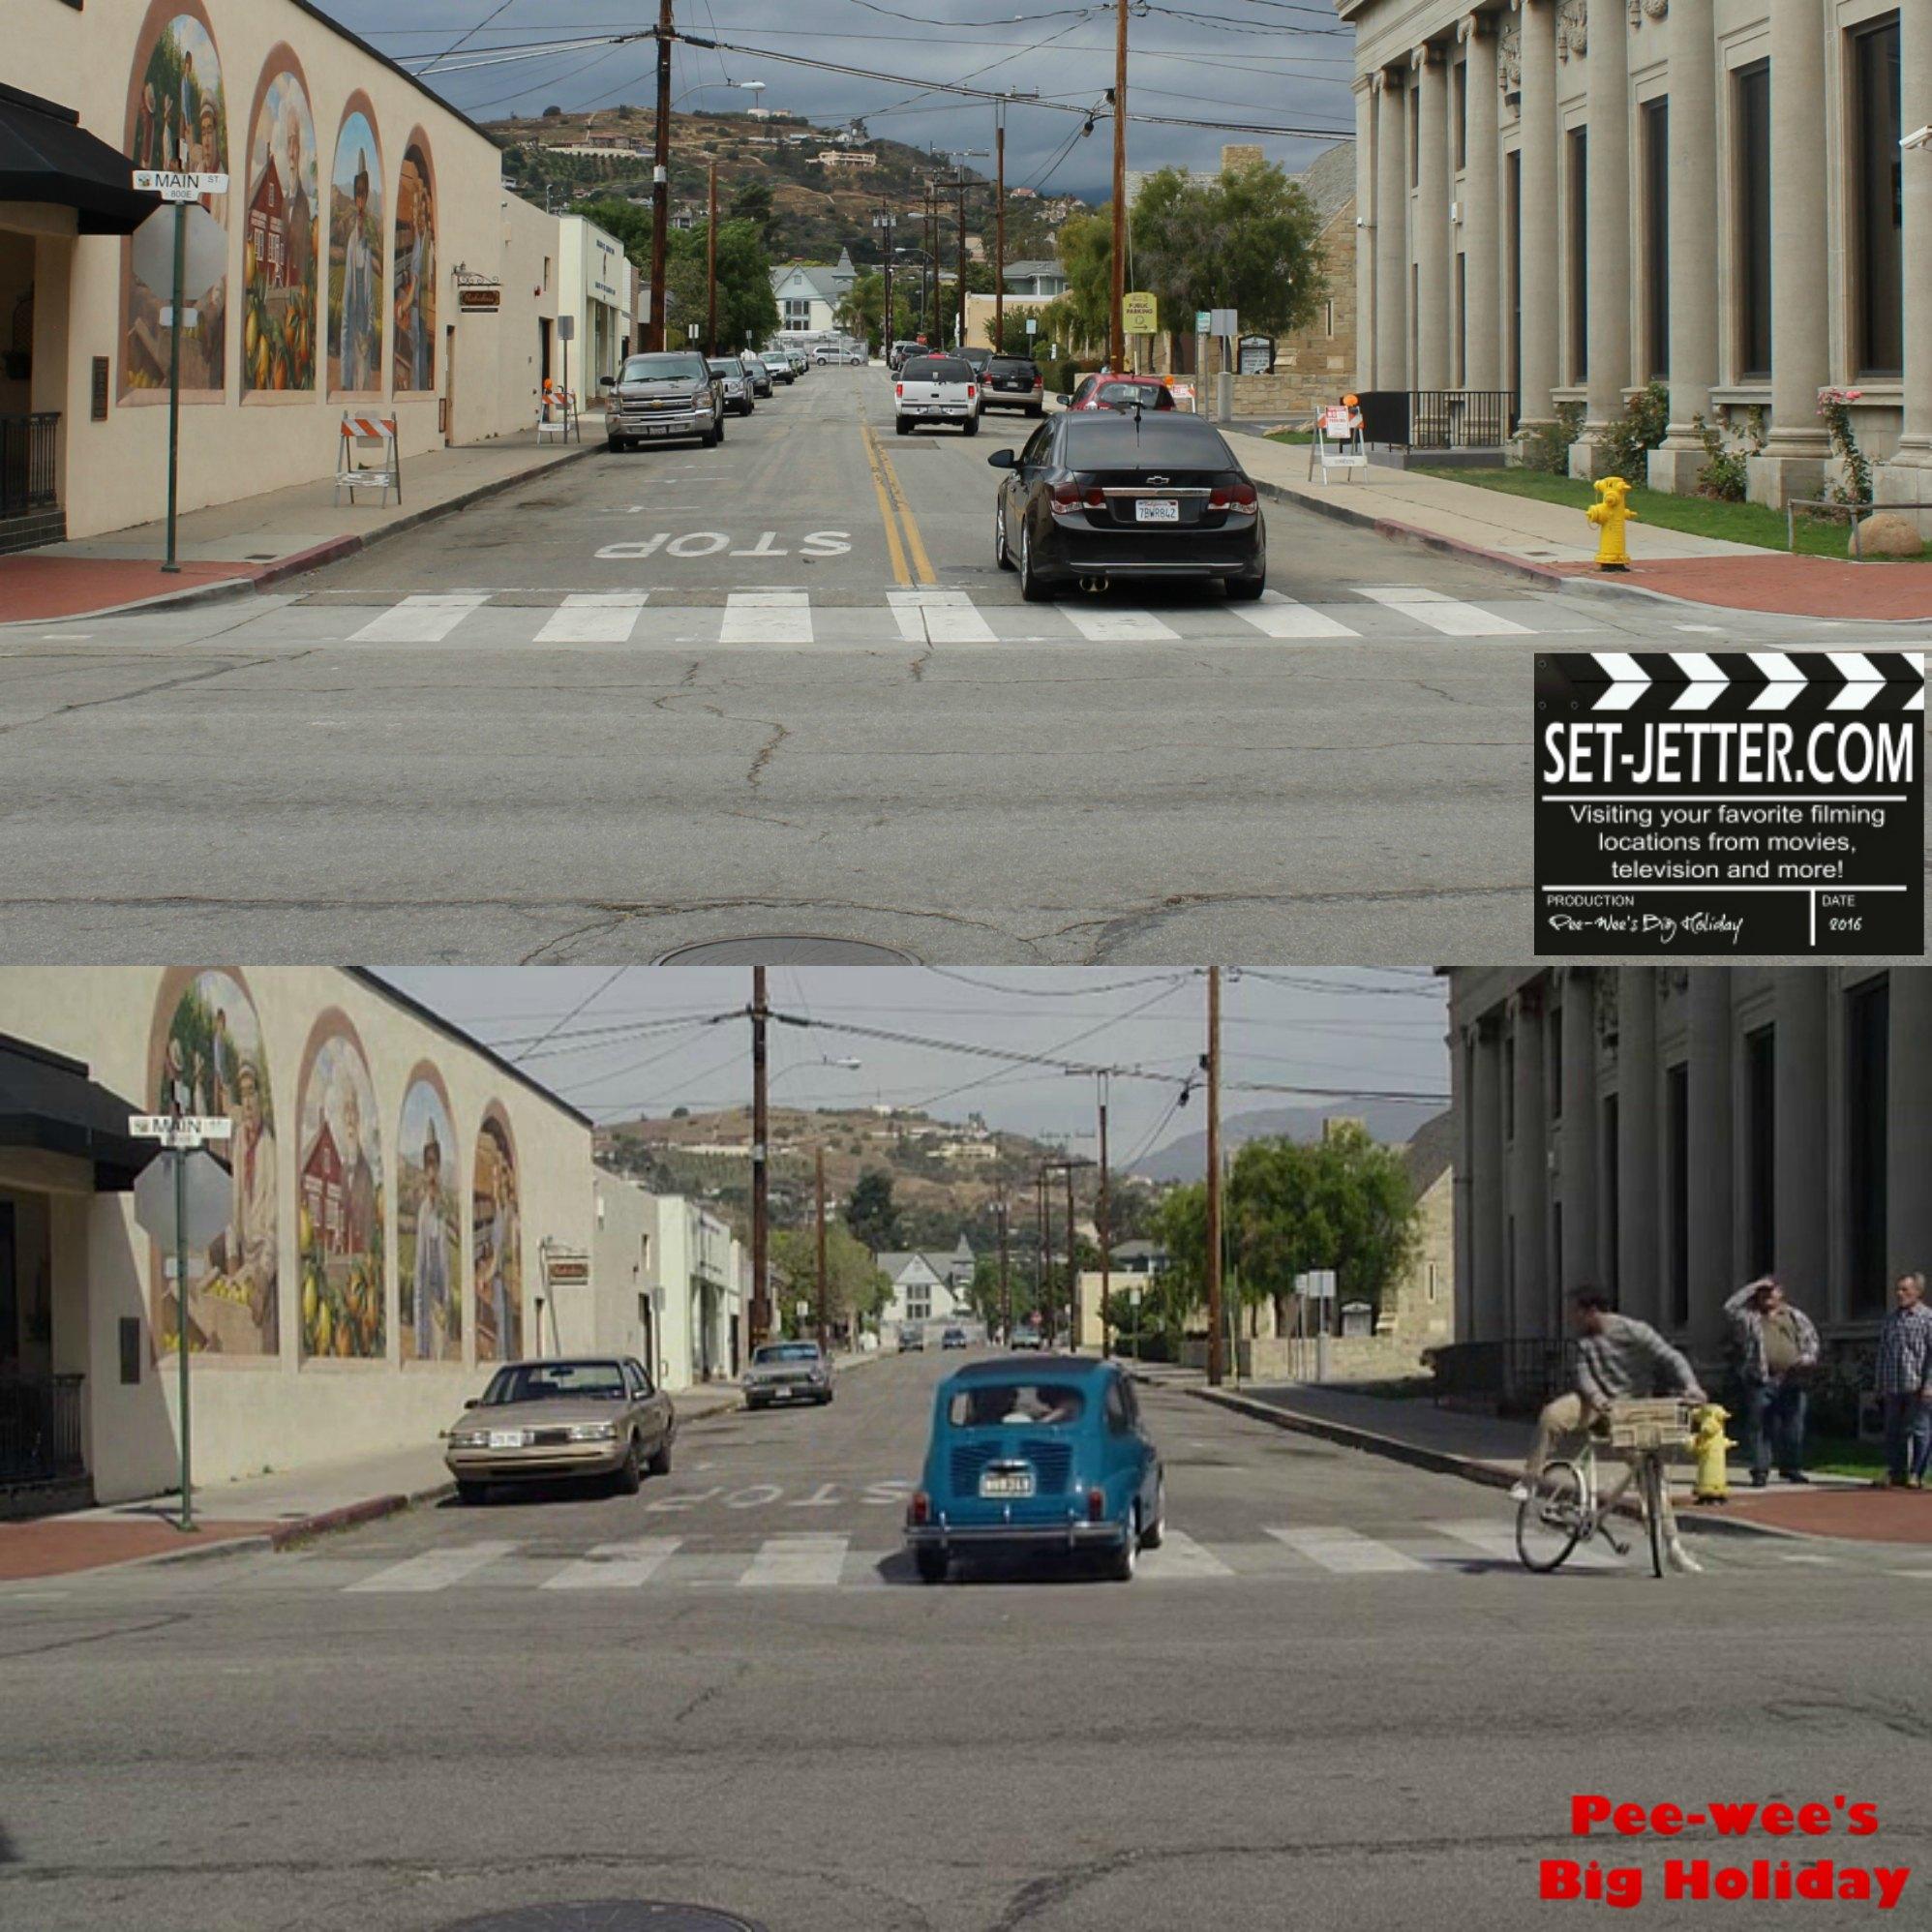 Pee Wee's Big Holiday comparison 351.jpg